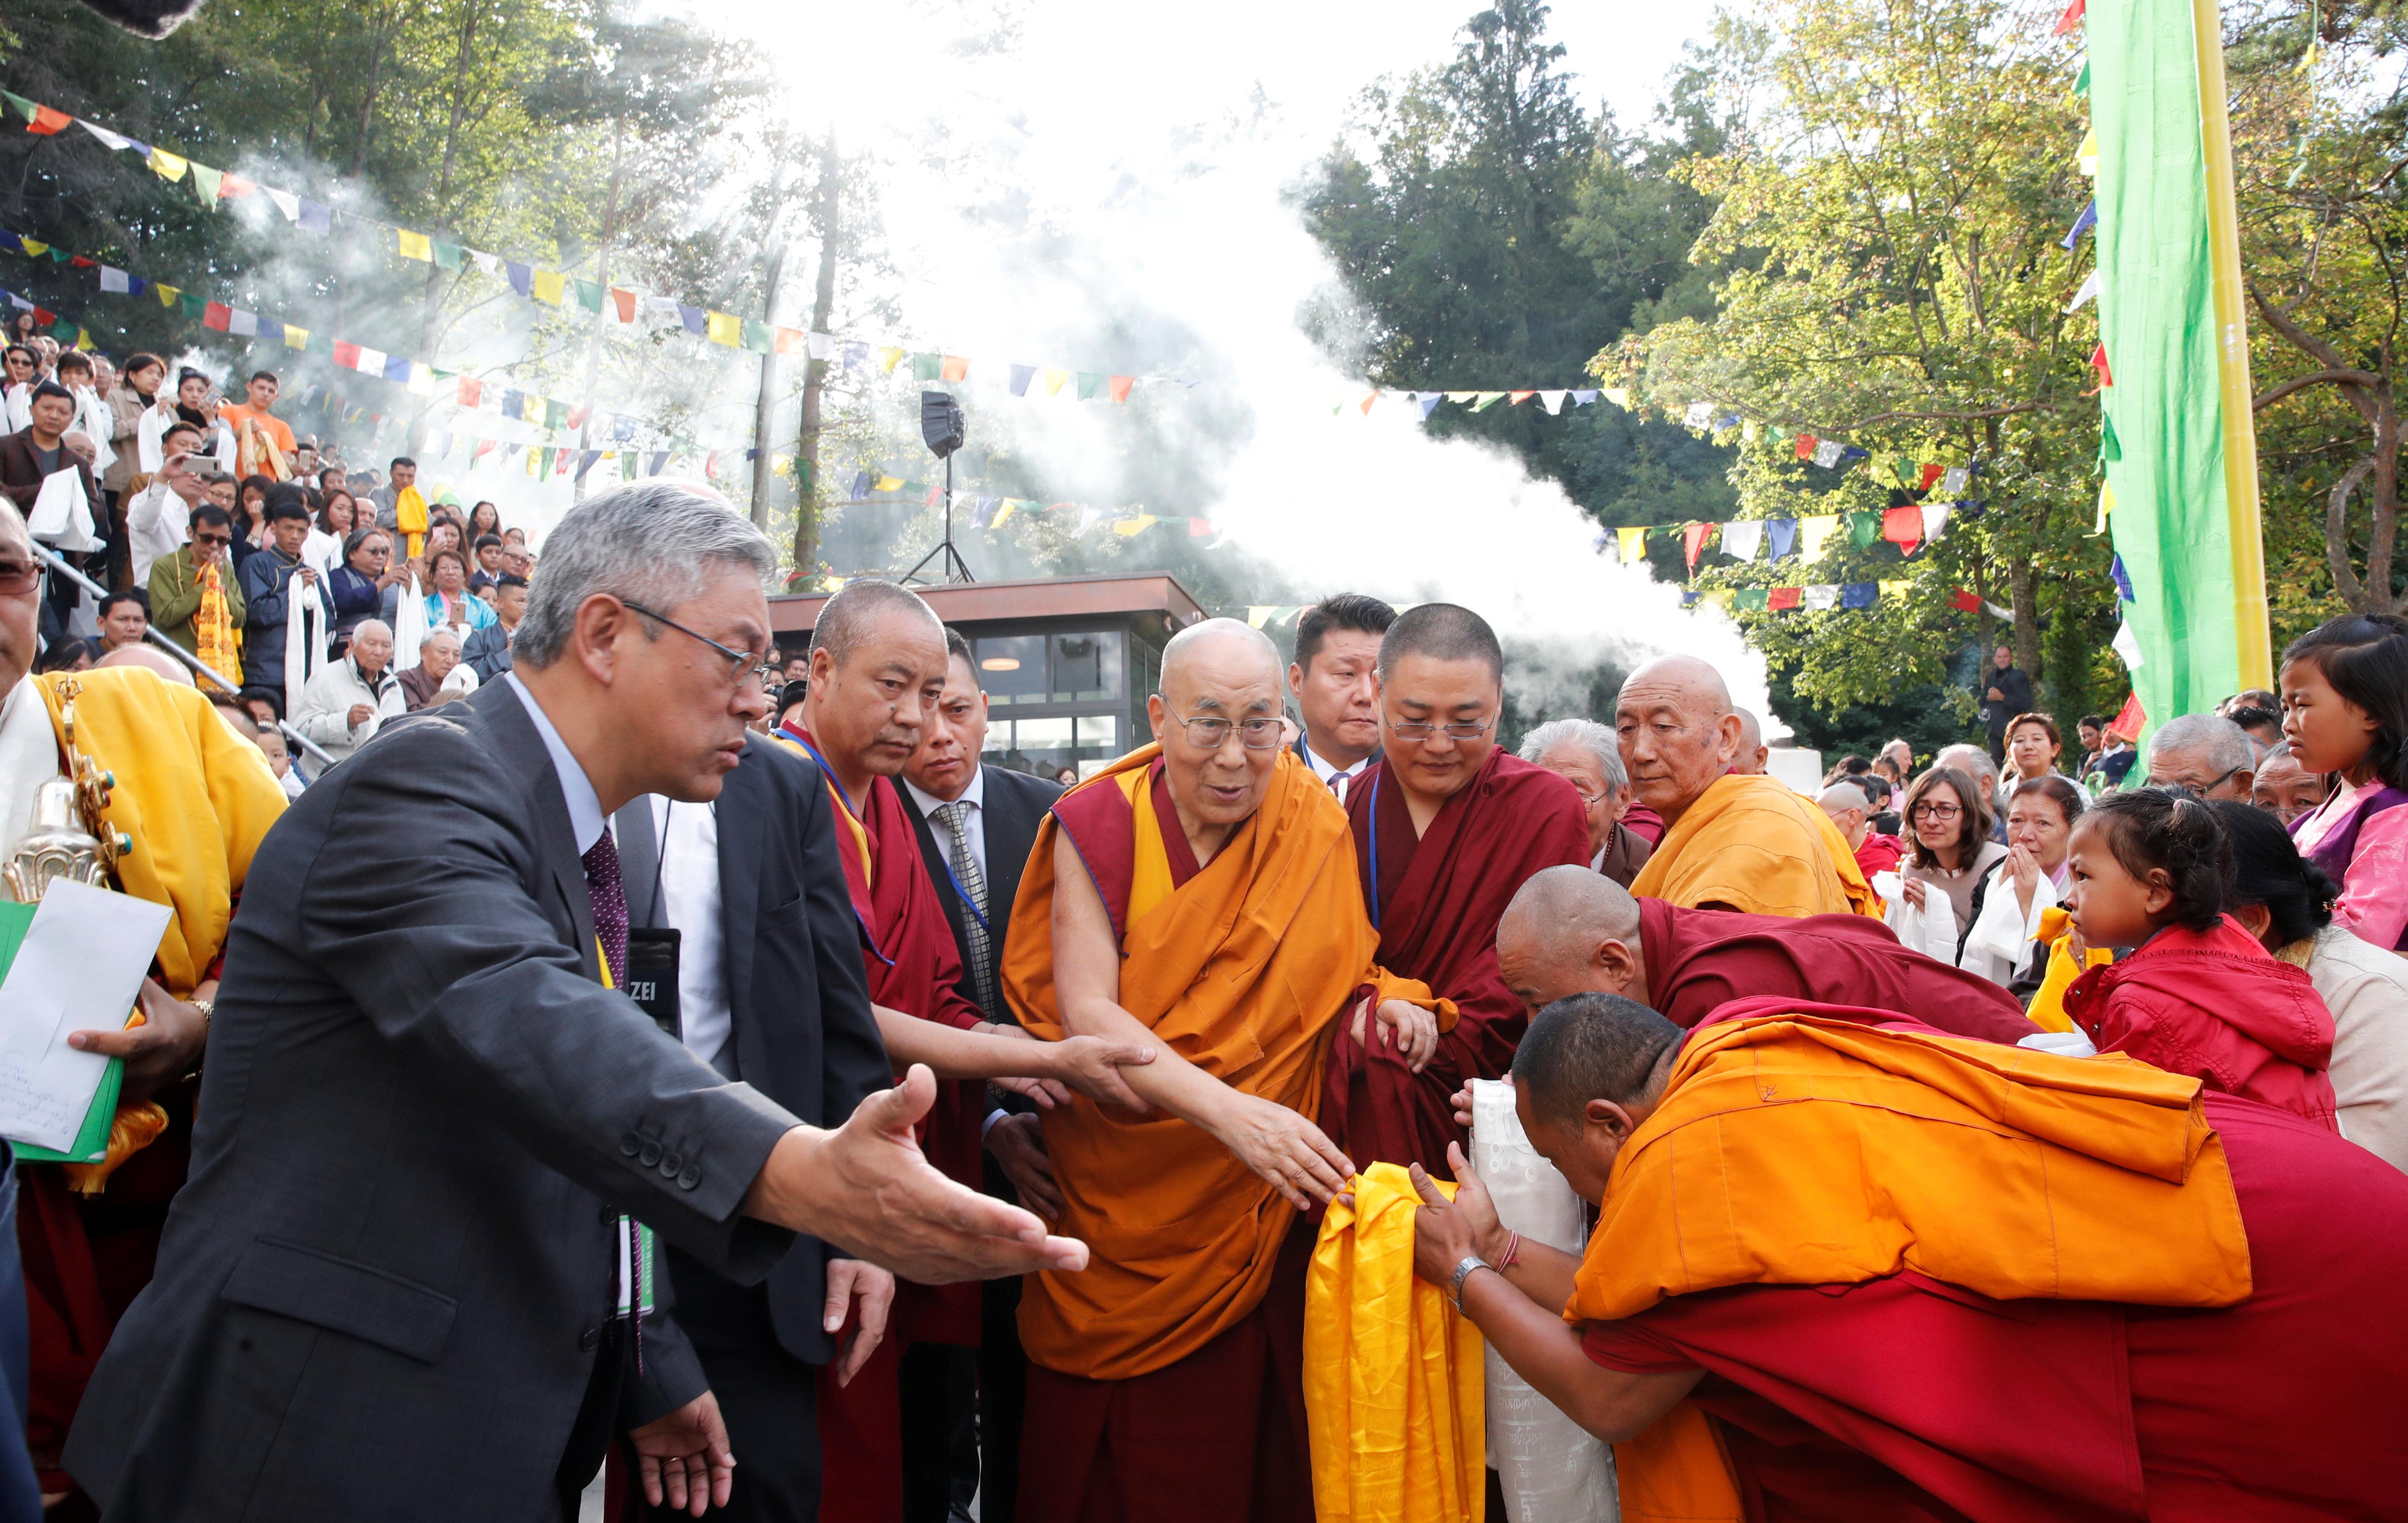 Dalai Lama in Switzerland